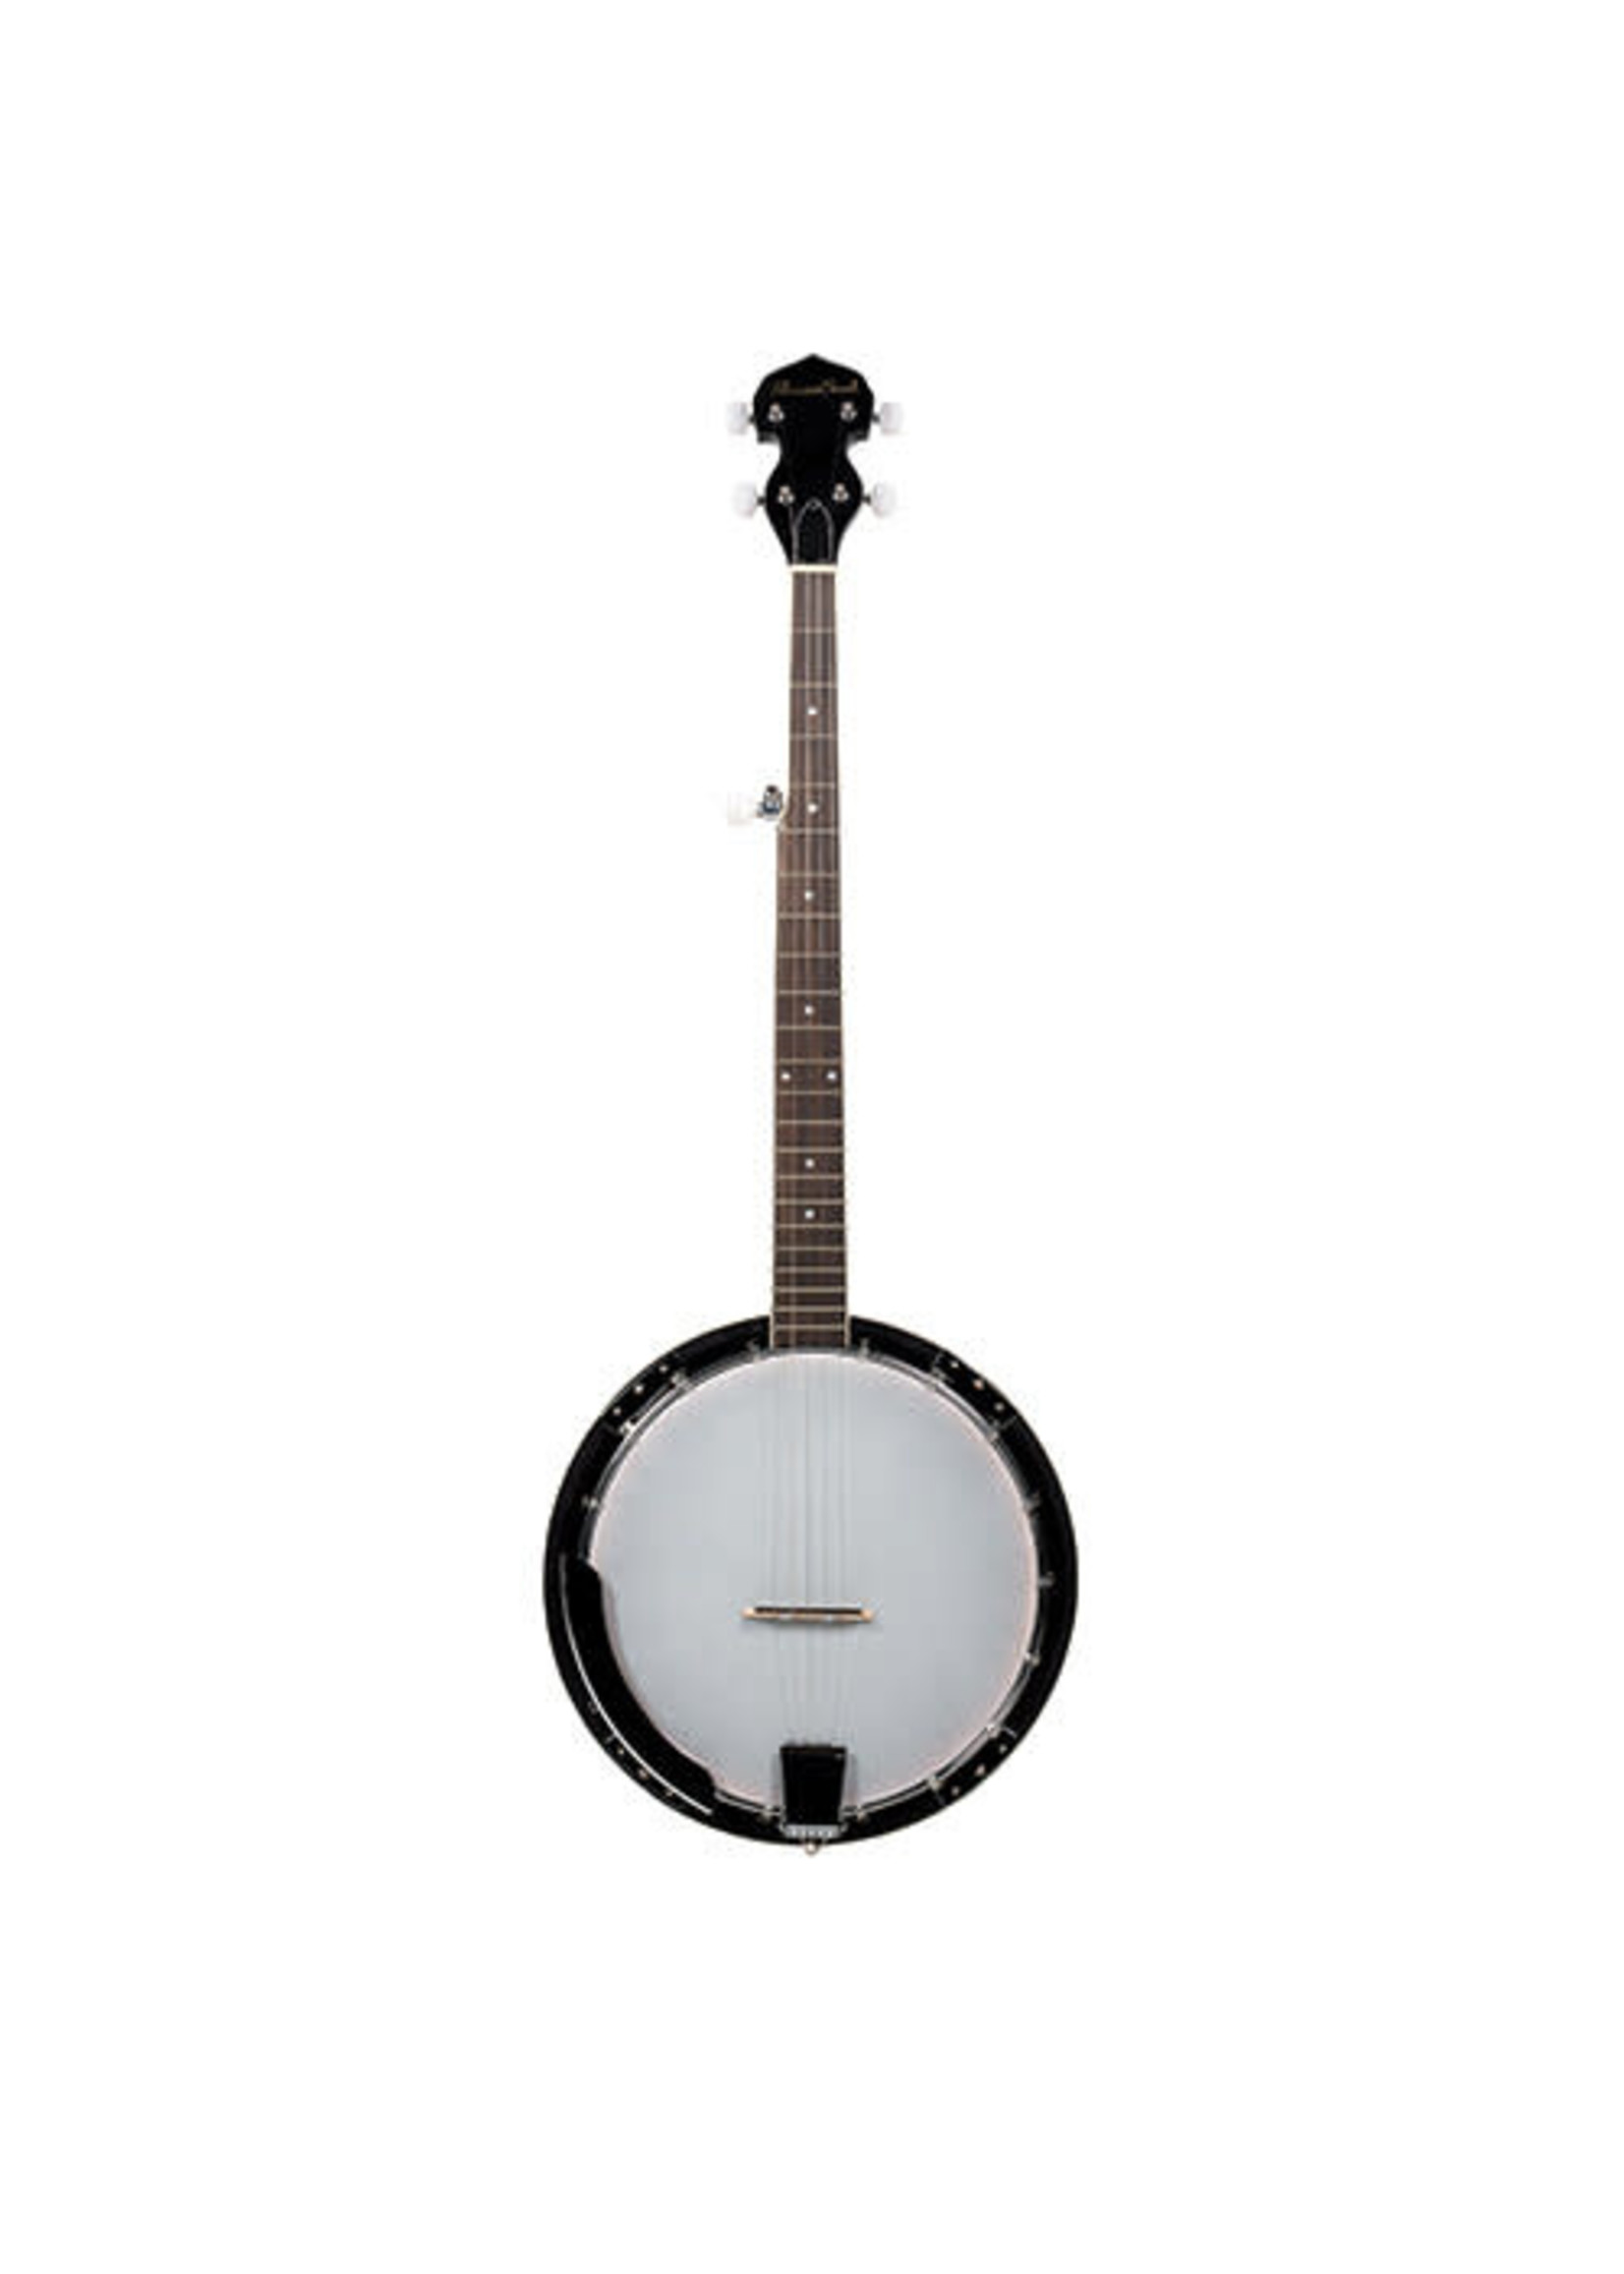 BeaverCreek Banjo 18 Brackets